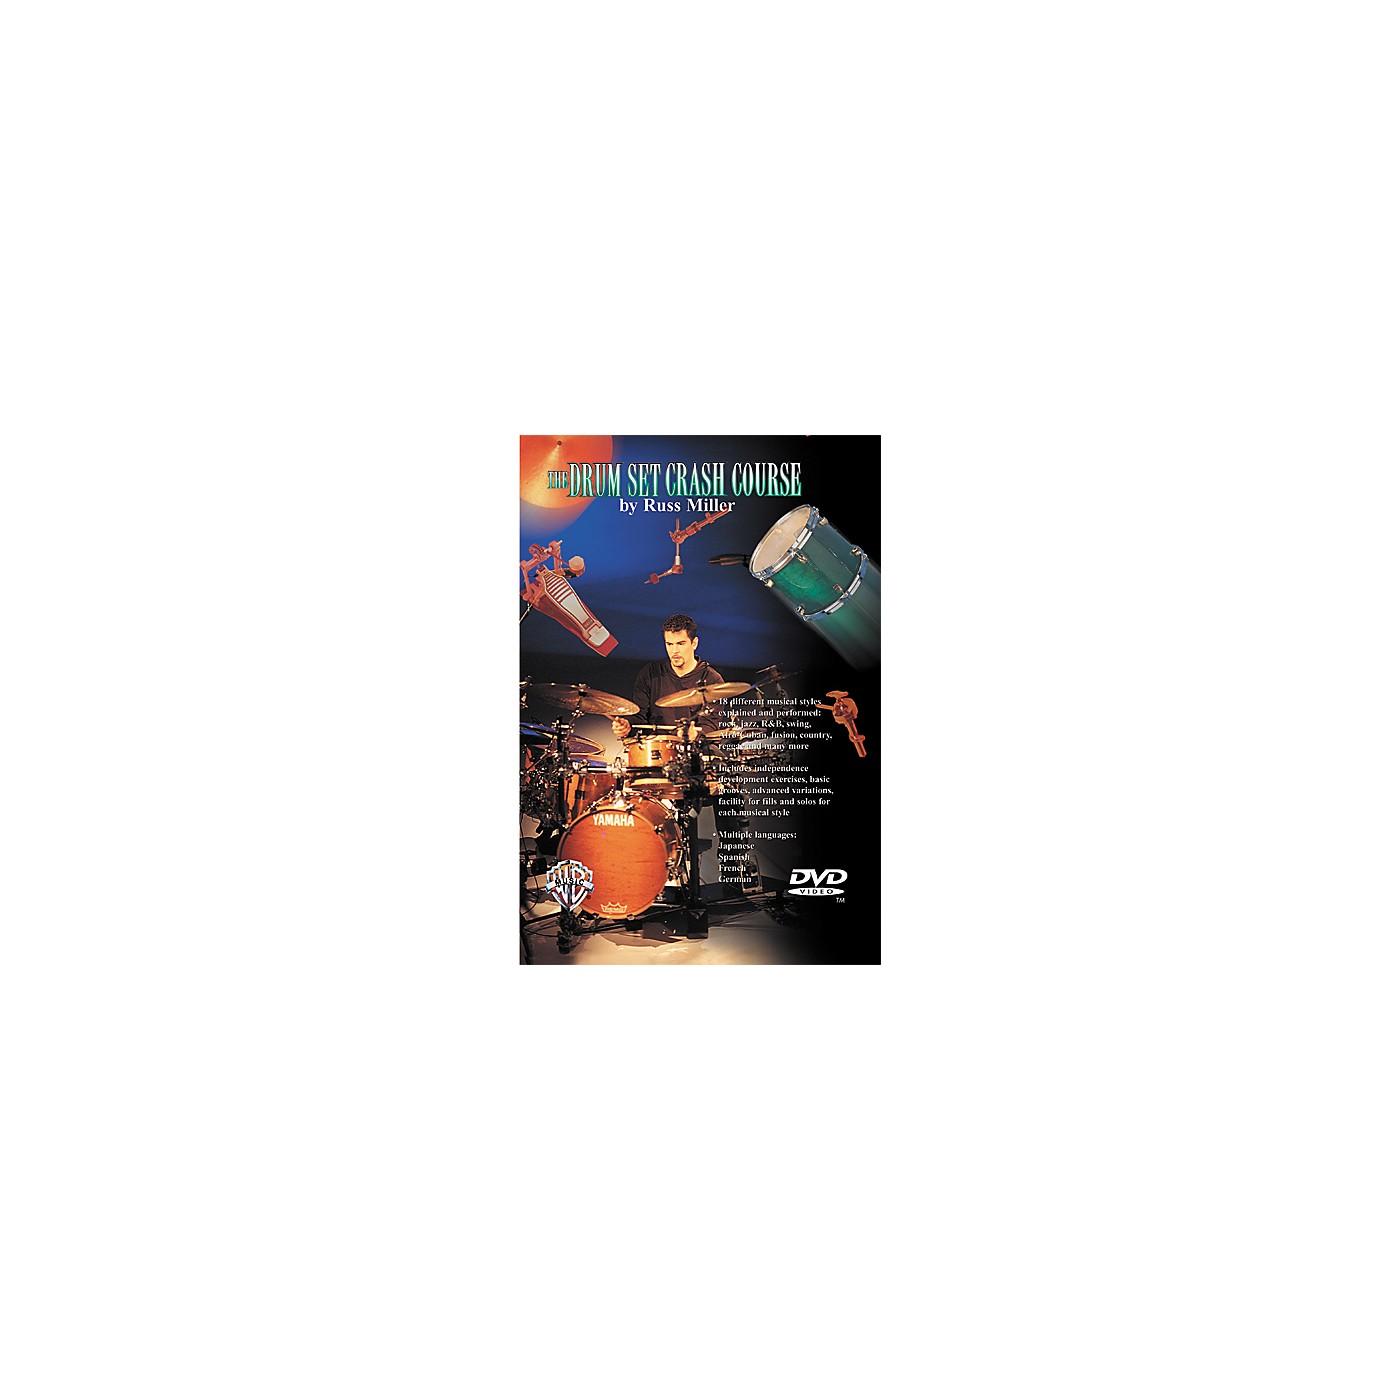 Alfred Russ Miller - Drumset Crash Course DVD thumbnail